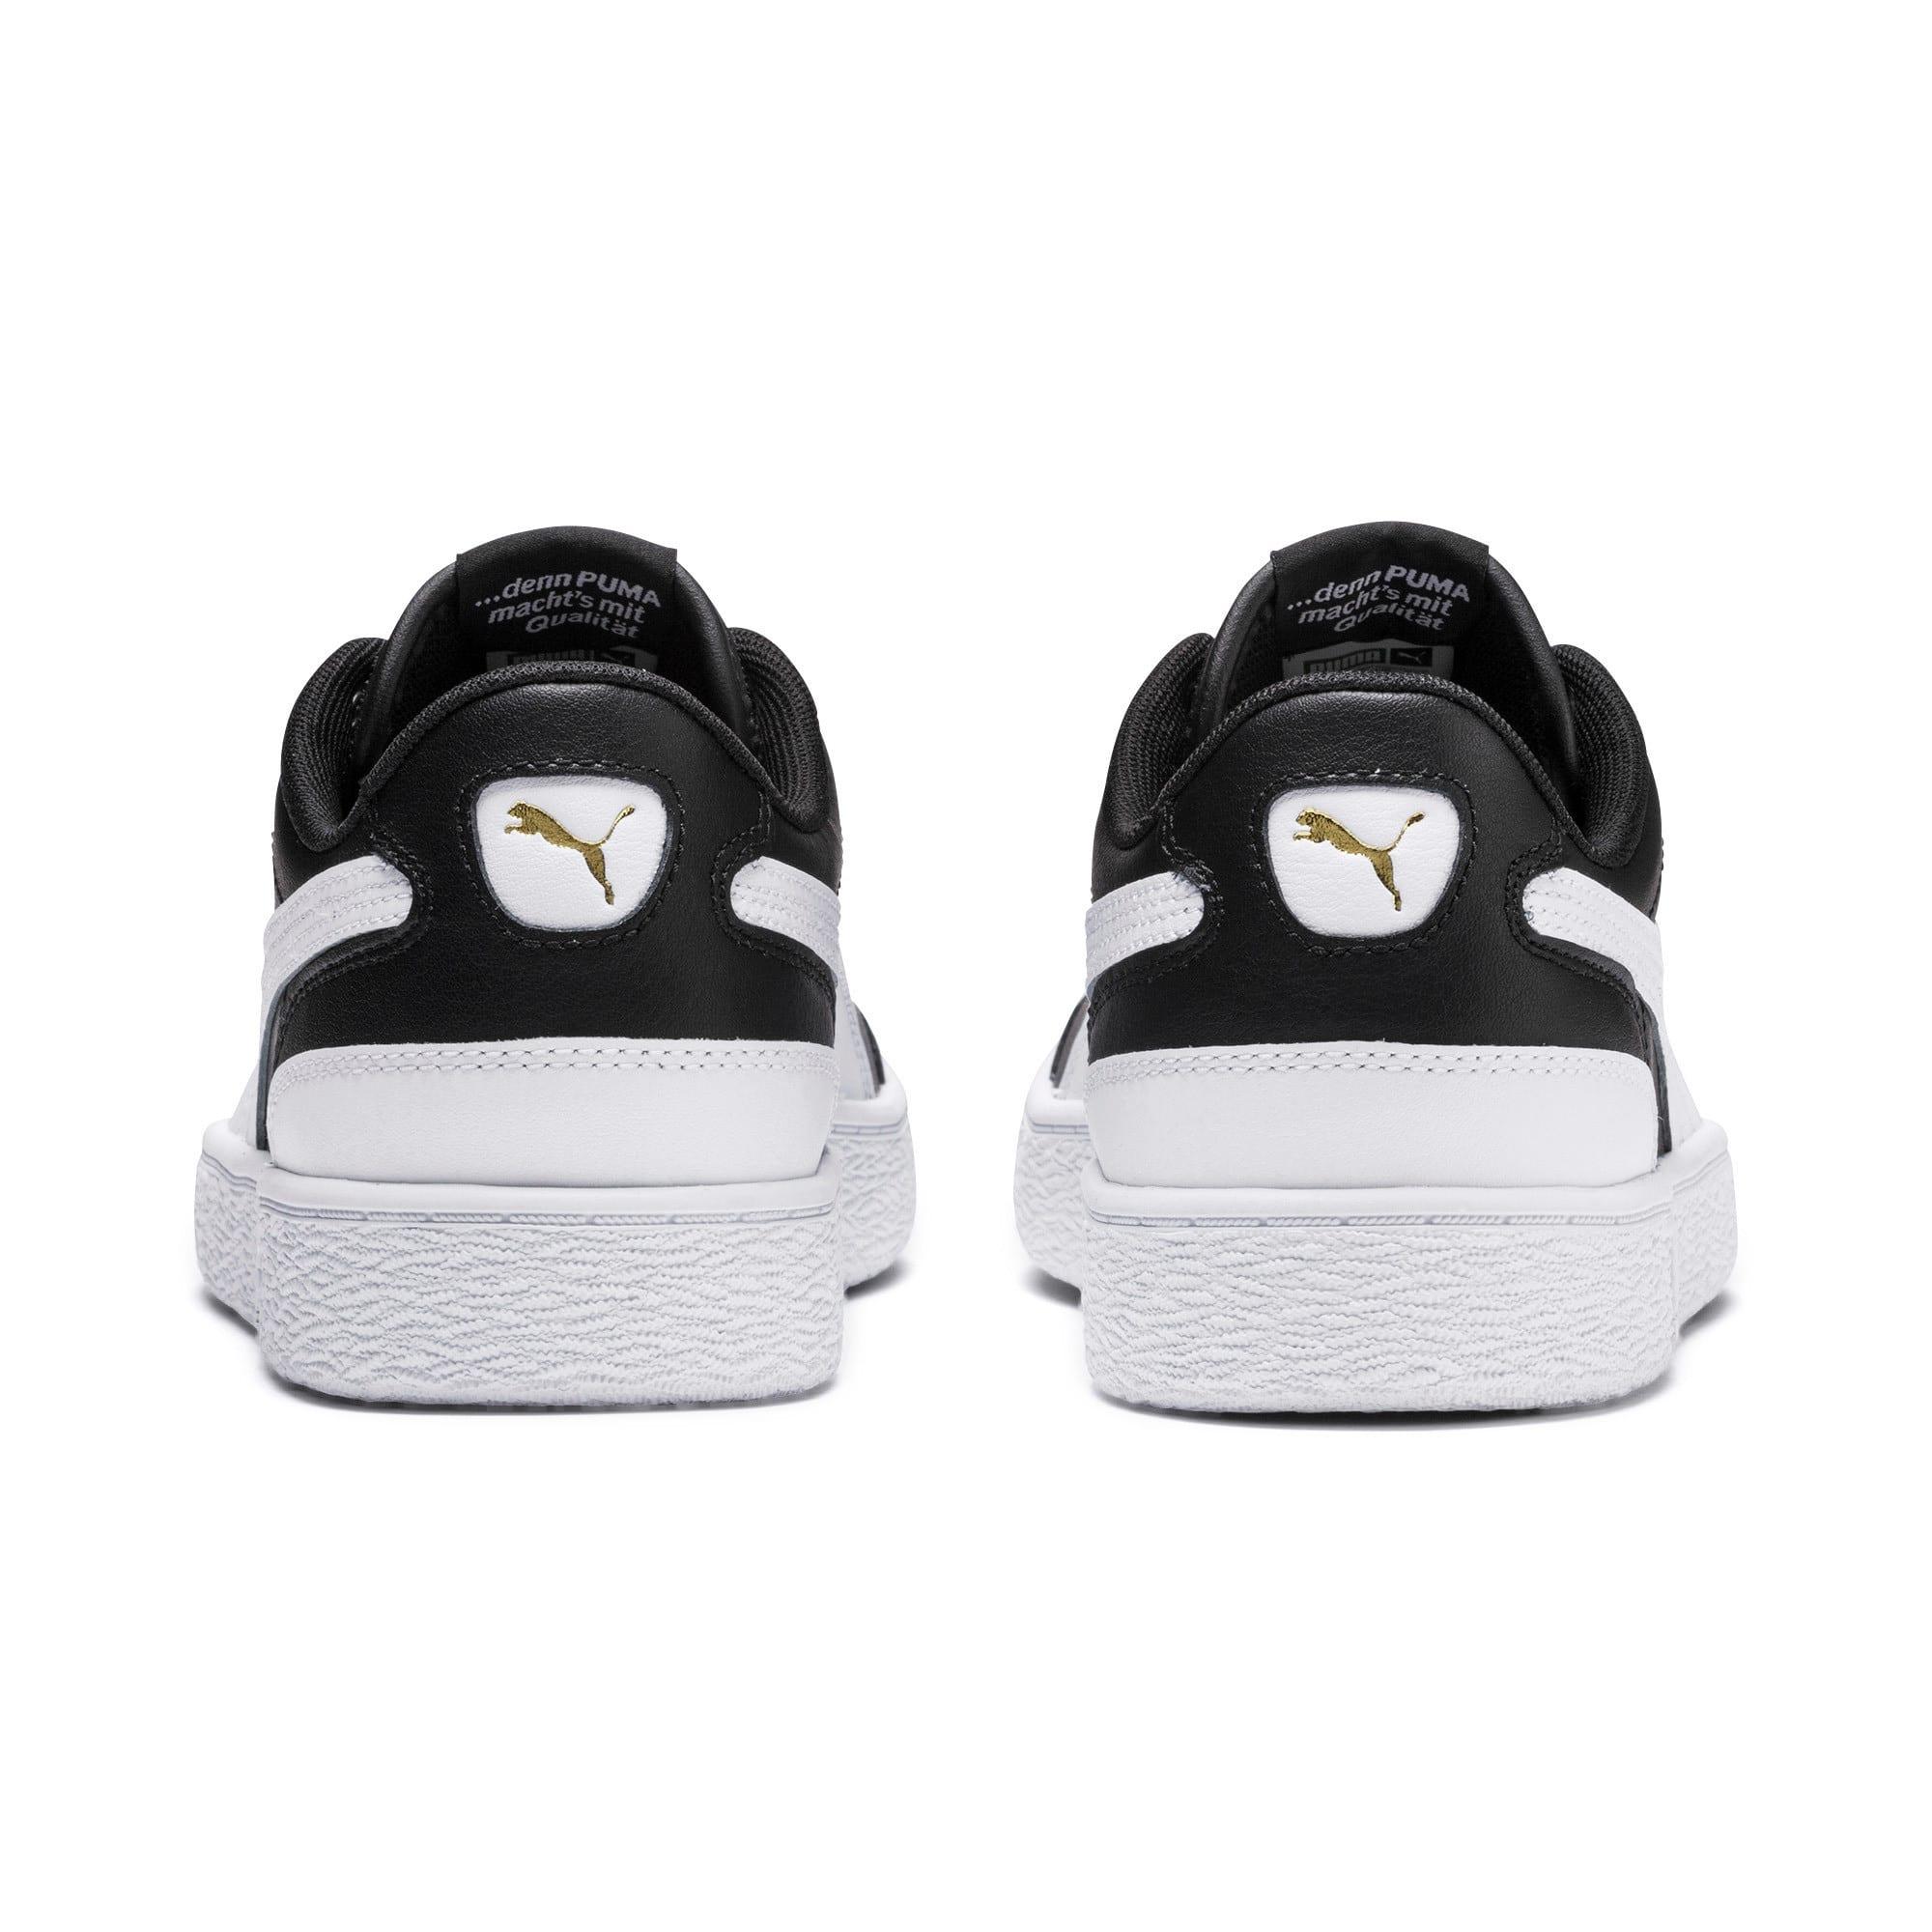 Thumbnail 3 of Ralph Sampson Lo Sneakers, Puma Blk-Puma Wht-Puma Wht, medium